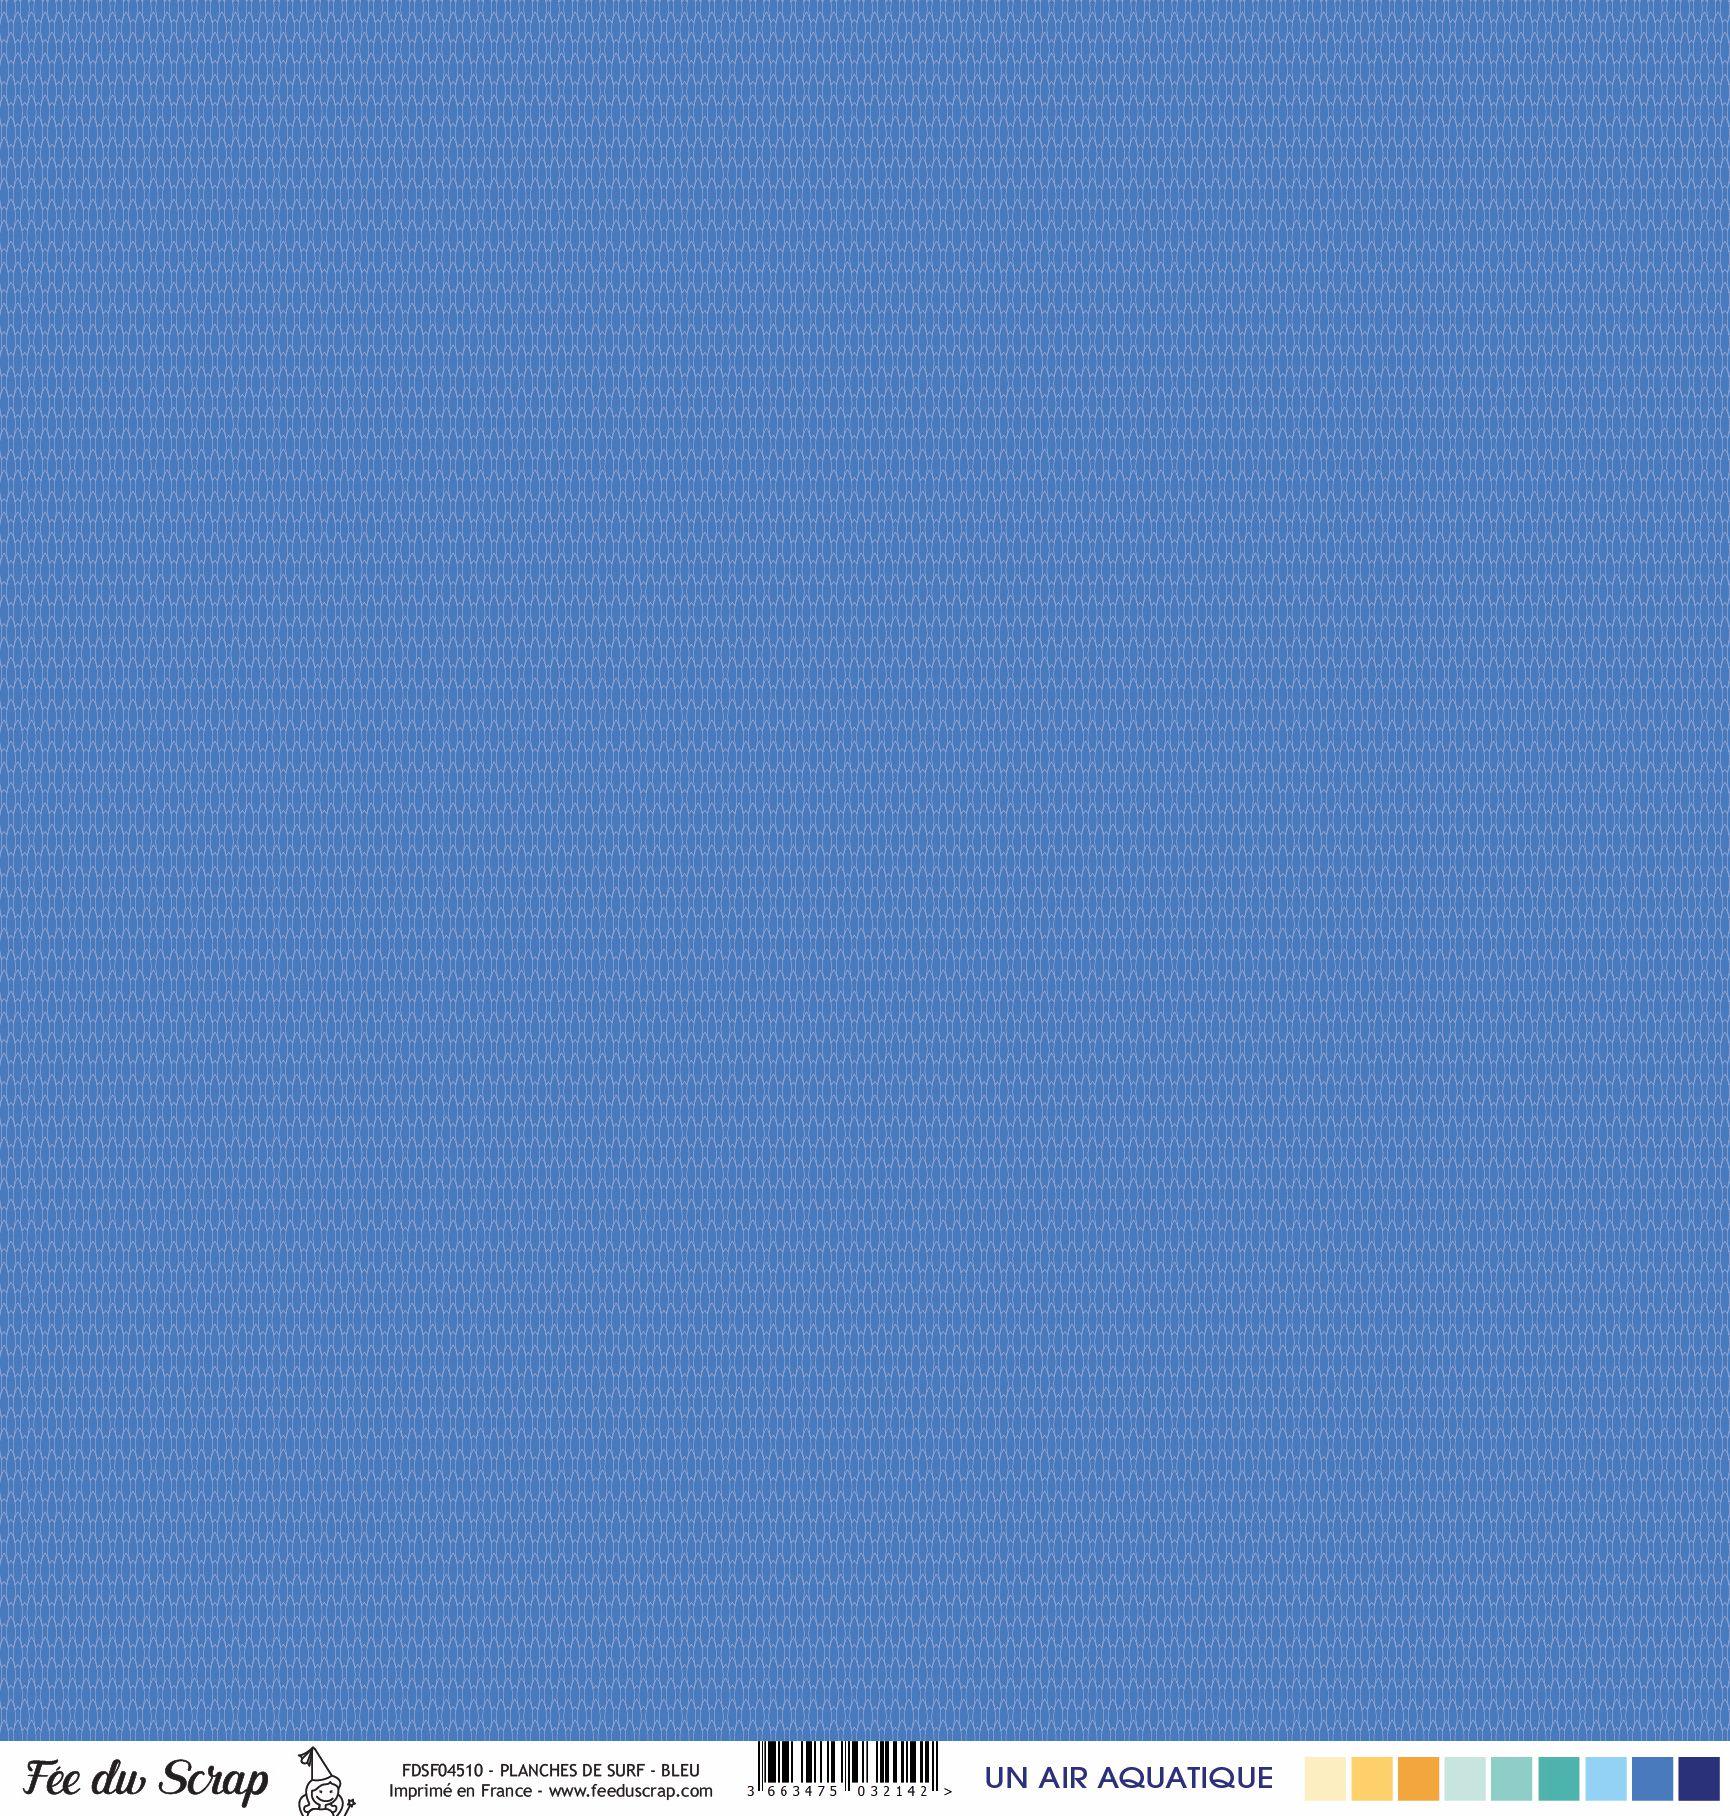 Feuille un air aquatique - Planches de surf bleu